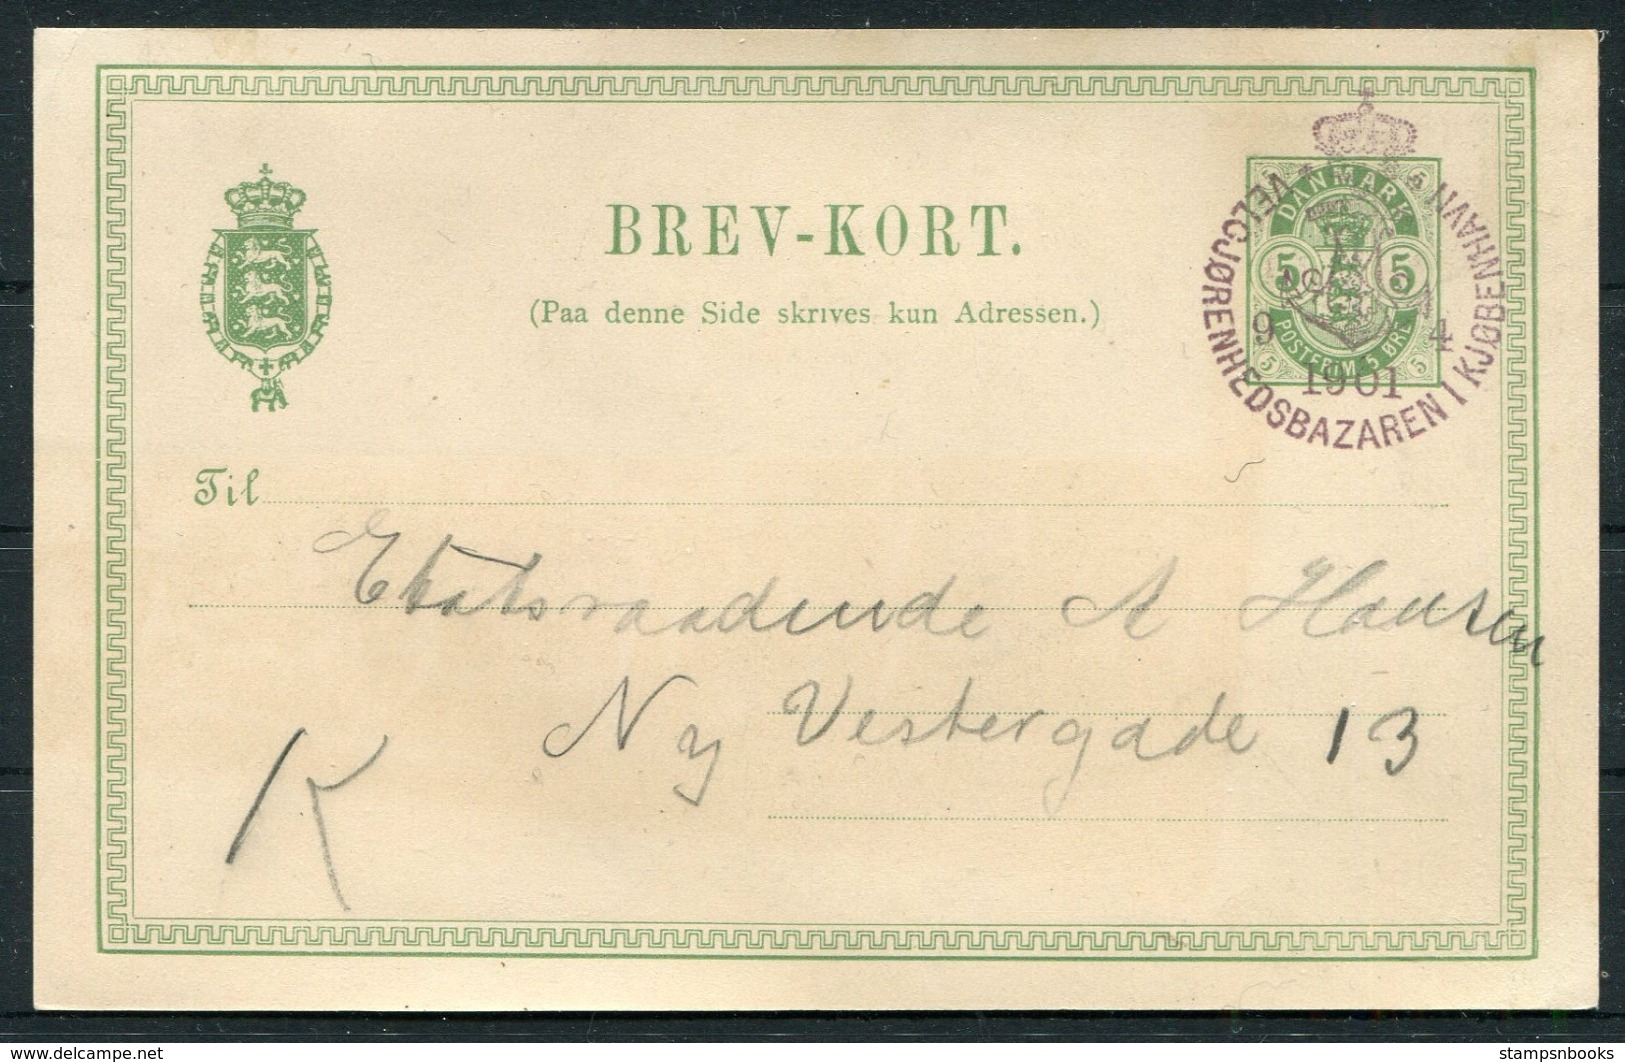 5 øre Illustreret Helsagsbrevkort Annulleret Med Særstempel Velgjørenhedsbazaren I Kjøbenhavn D. 9.4.1901. - 1864-04 (Christian IX)